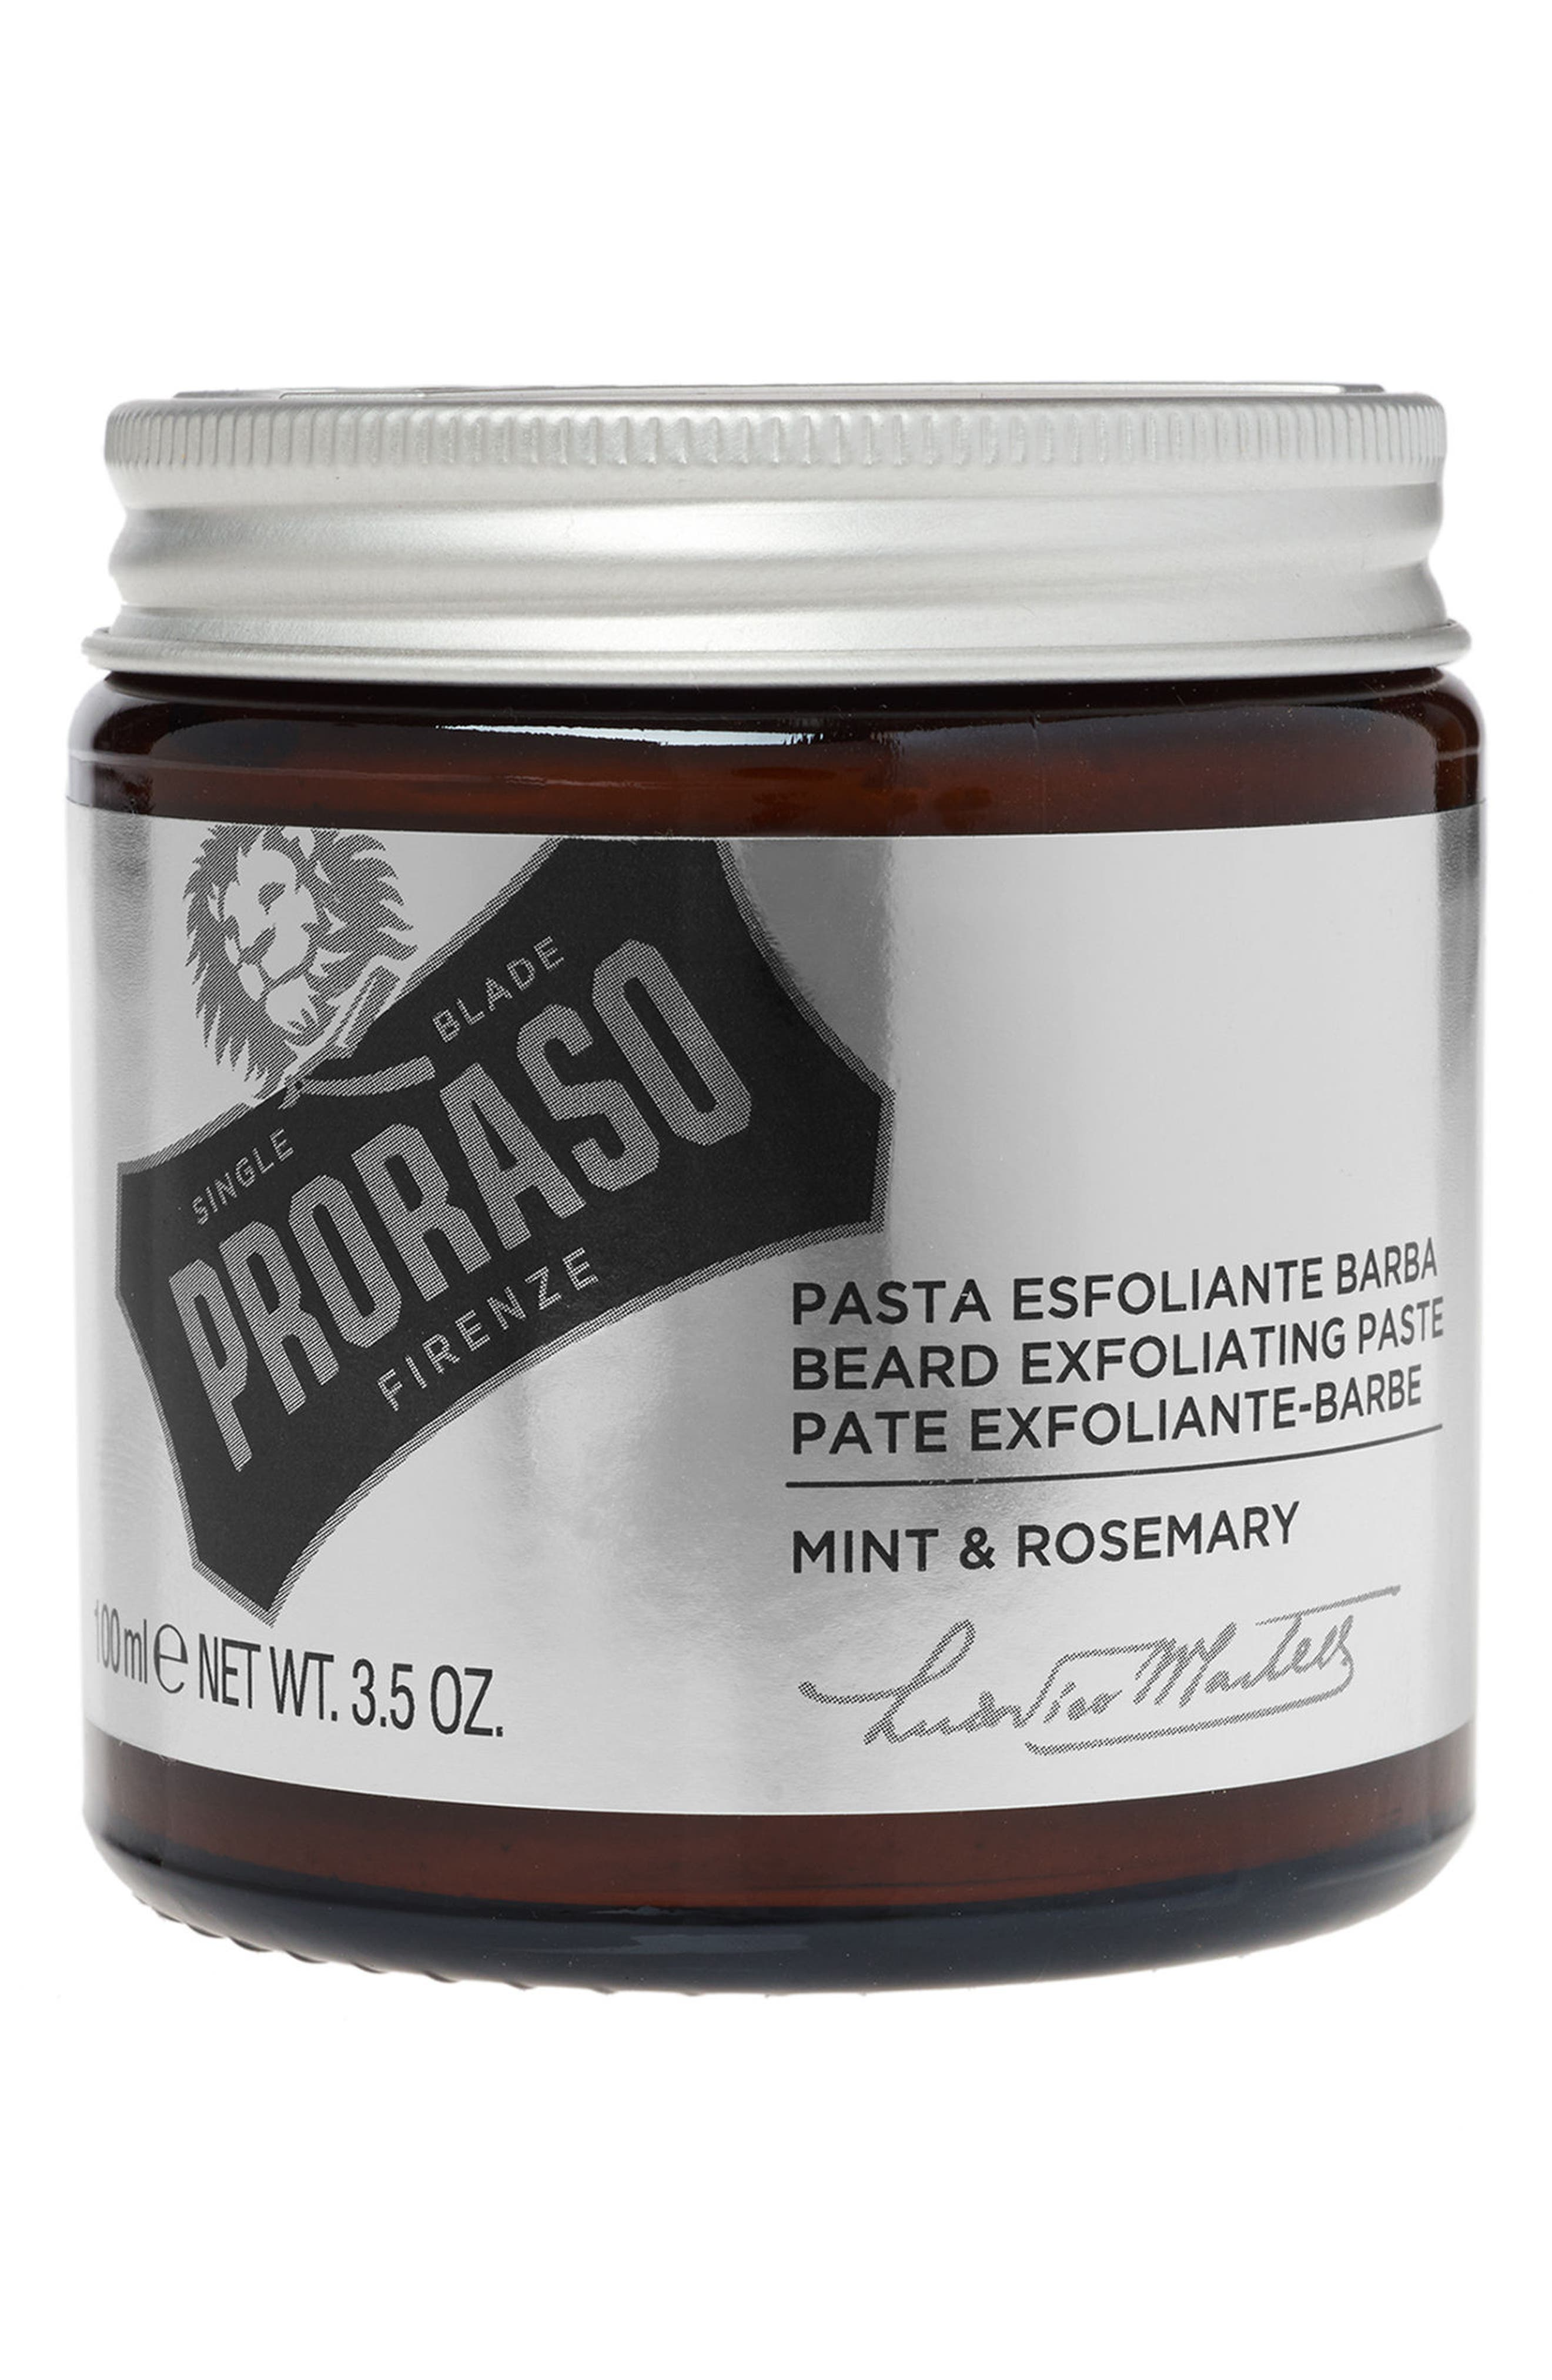 Men's Grooming Beard Exfoliate Paste,                         Main,                         color, No Color